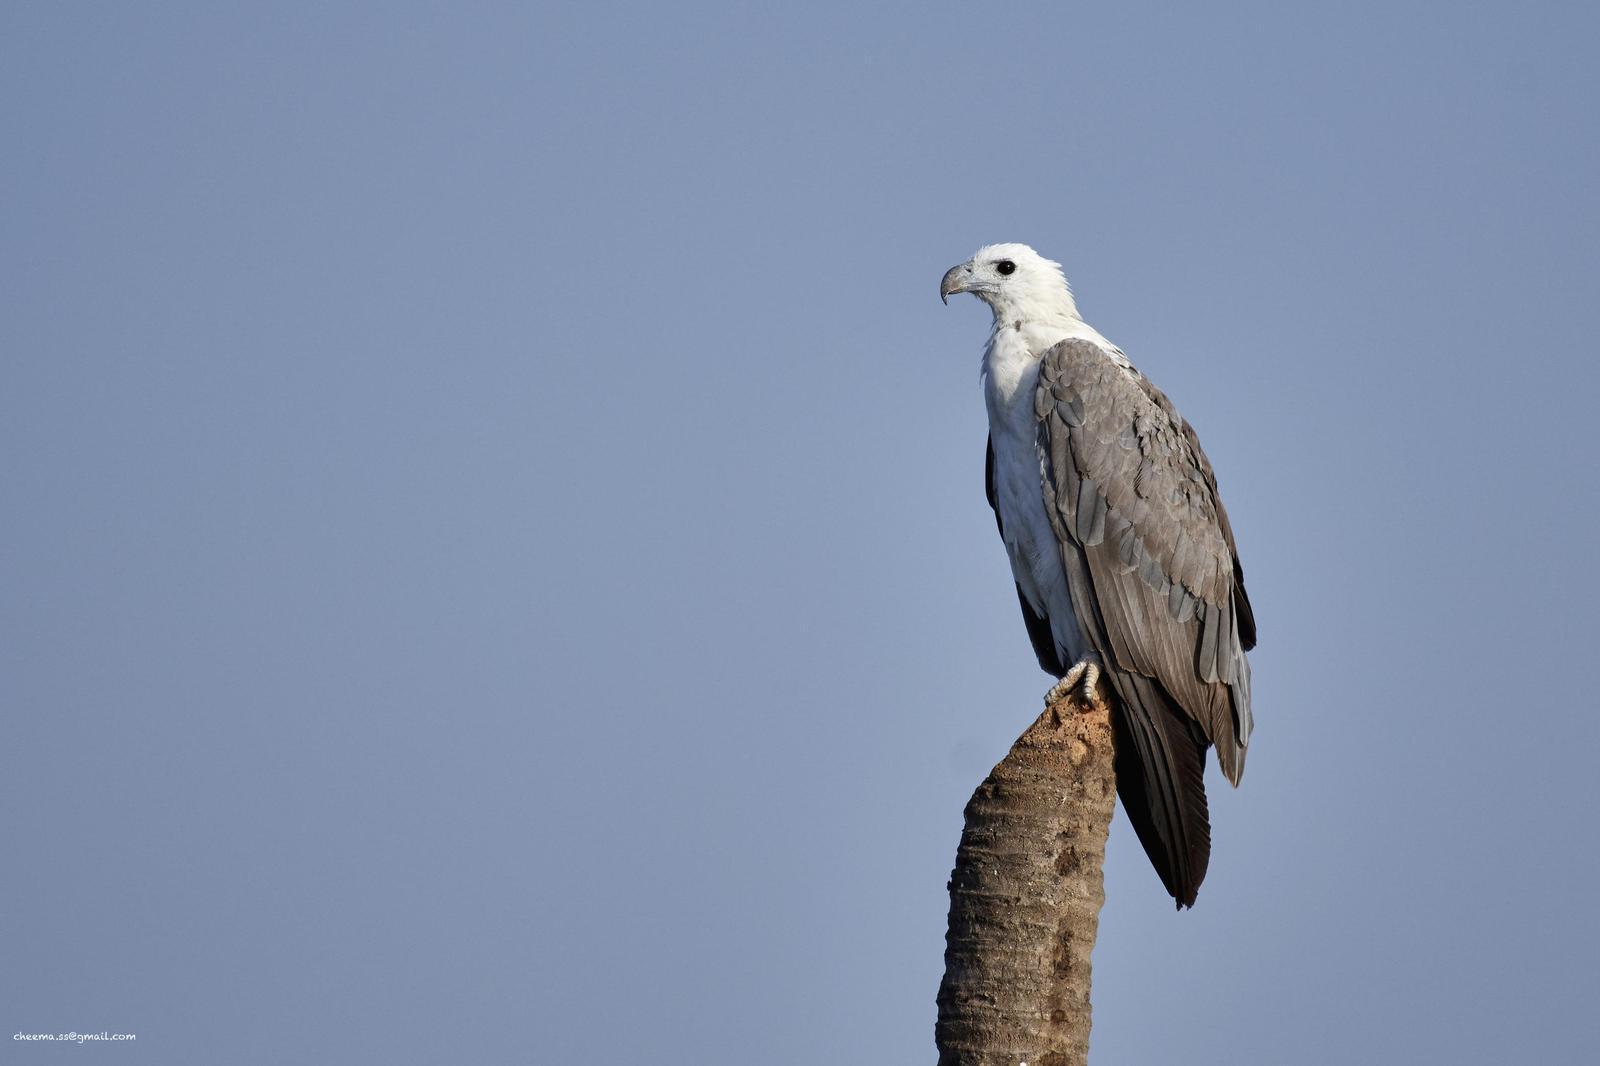 White-bellied Sea-Eagle Photo by Simepreet Cheema